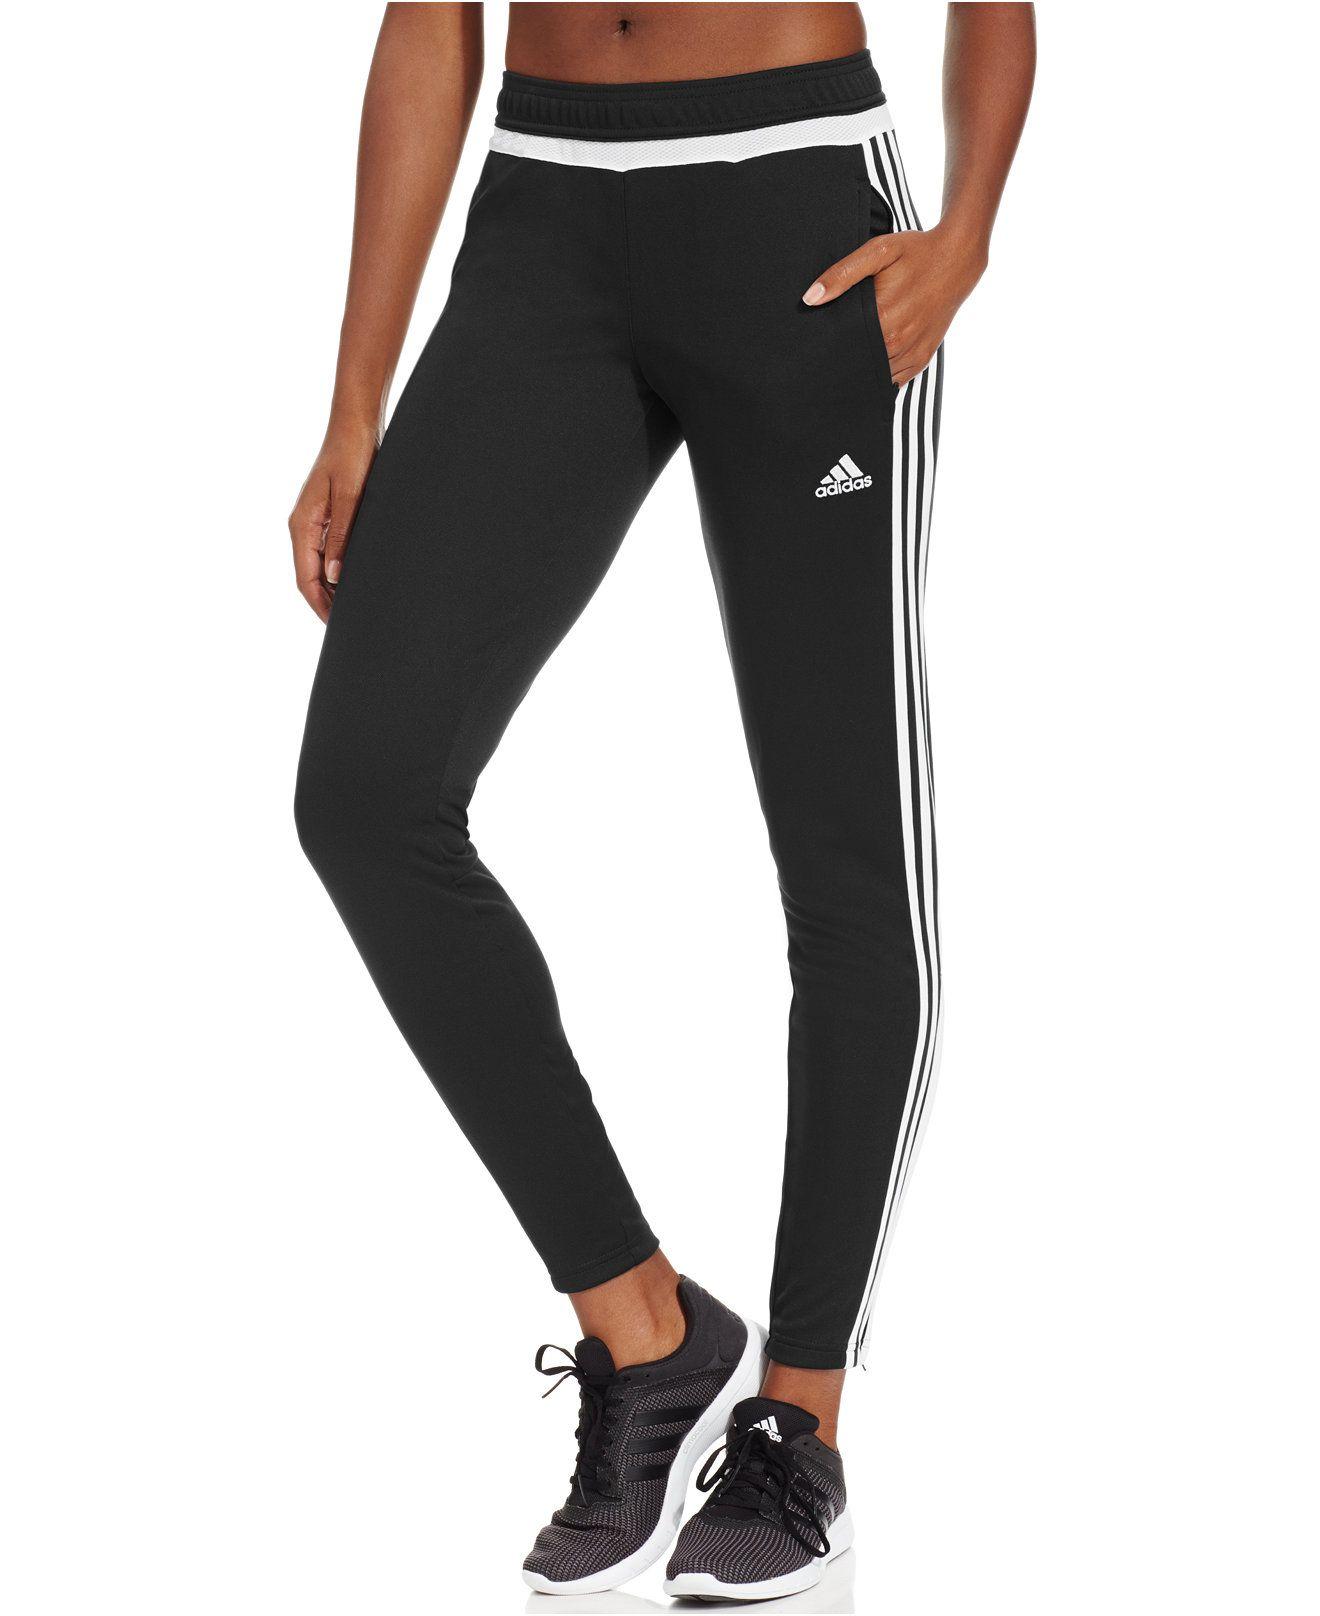 new product 150ac 81b0e adidas Tiro 15 ClimaCool® Training Pants - Pants - Women - Macy s